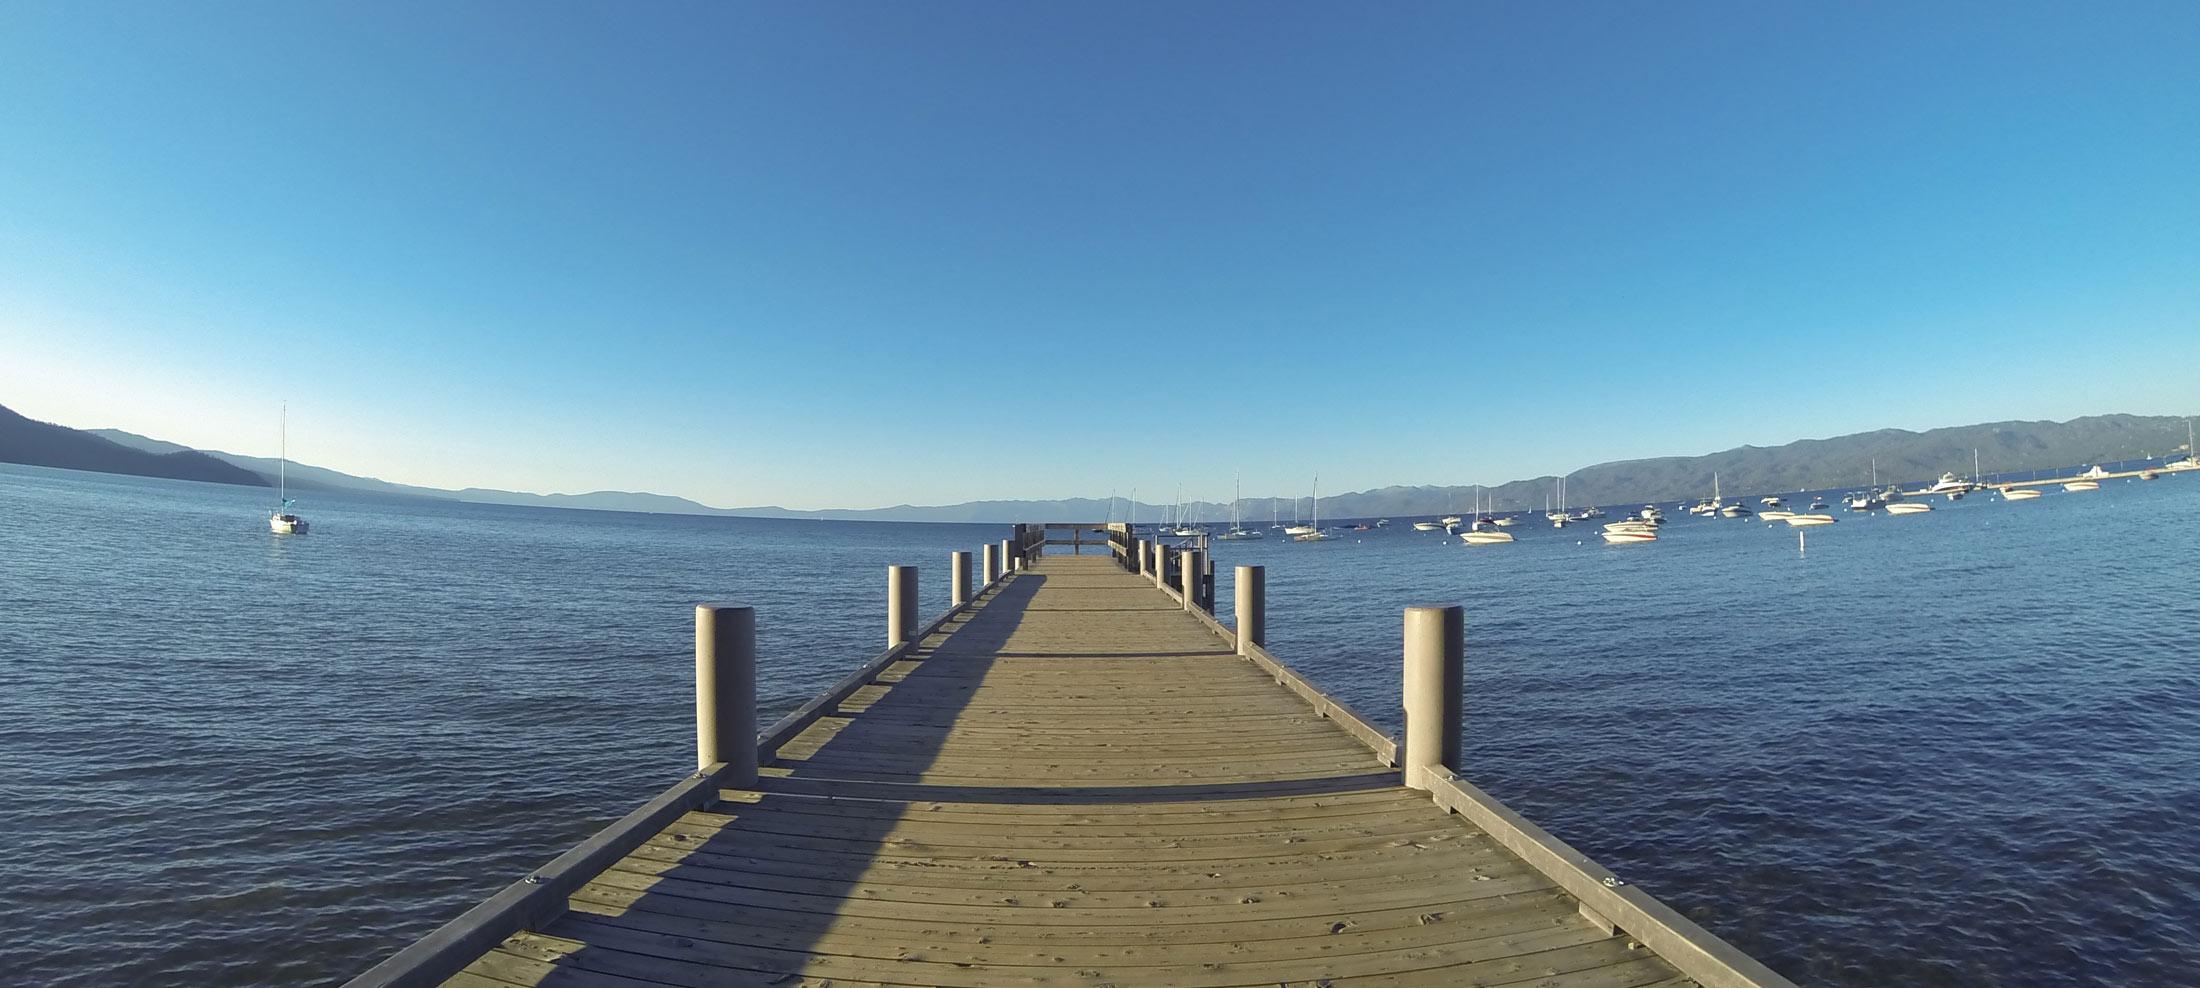 lake-tahoe-shot-by-shane-michael-hernandez-background-pic-1